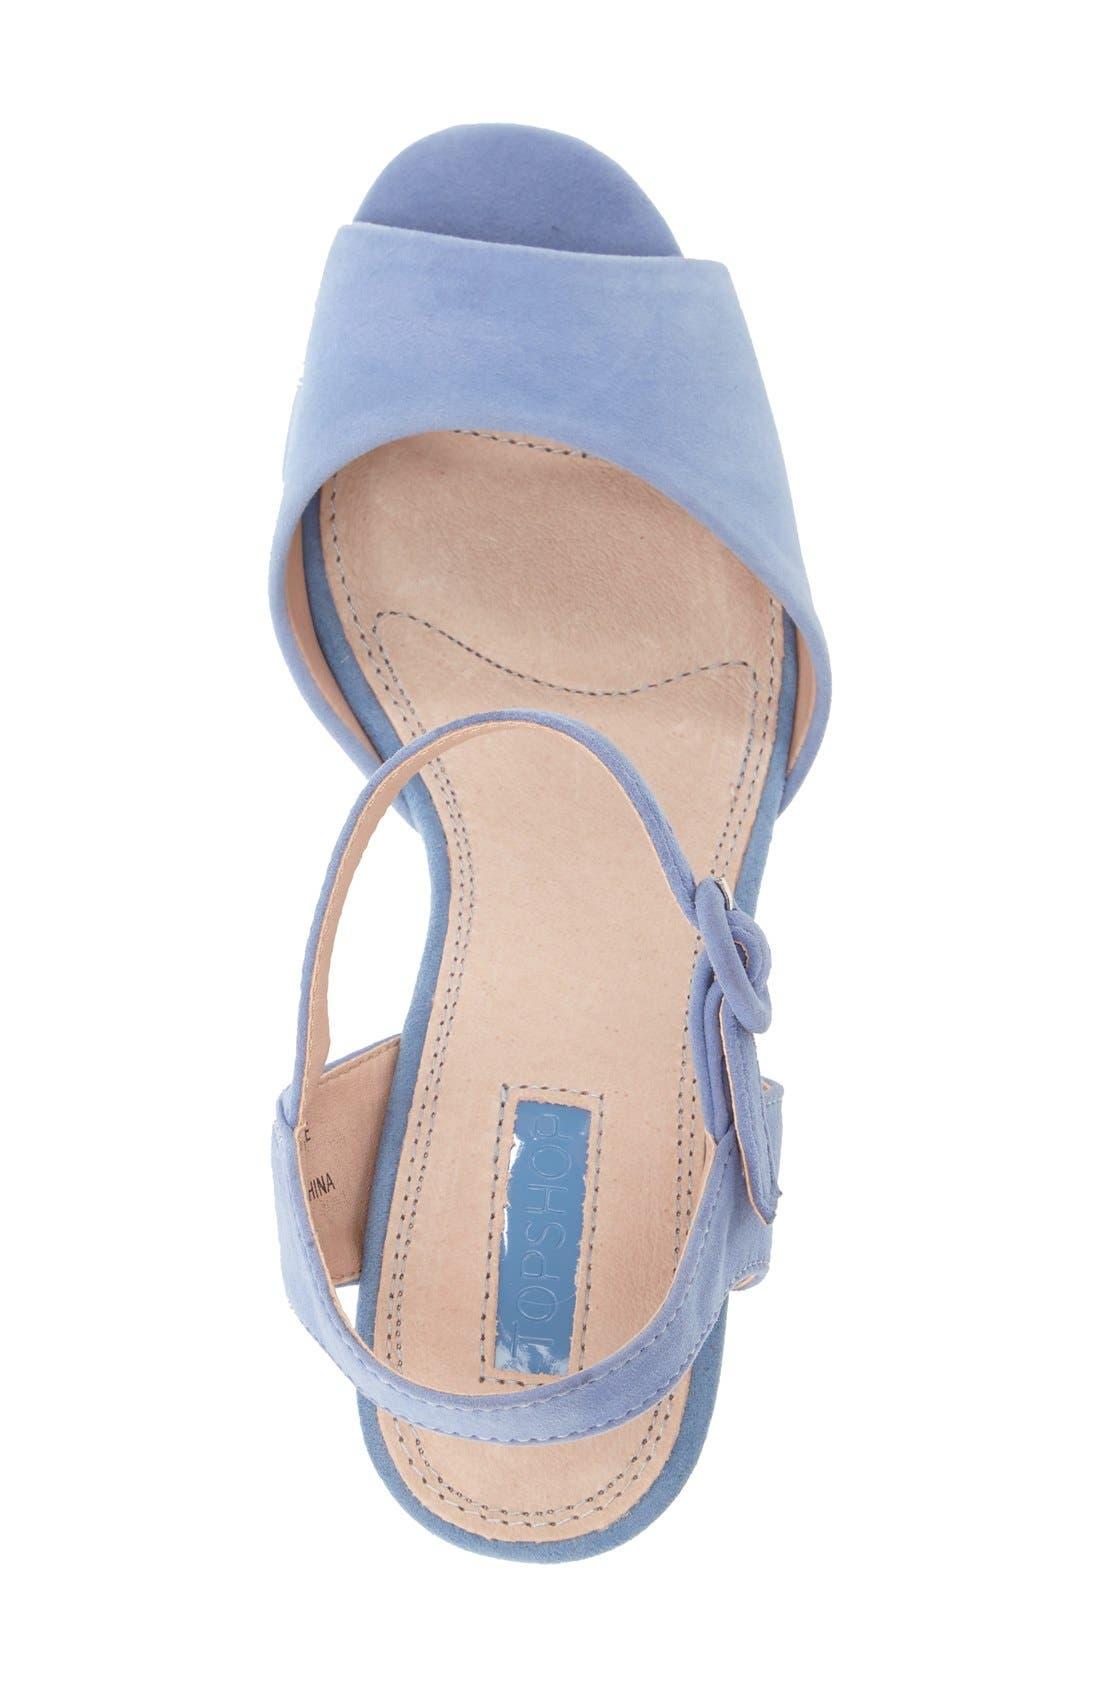 'Lana' Chunky Platform Sandal,                             Alternate thumbnail 3, color,                             Blue